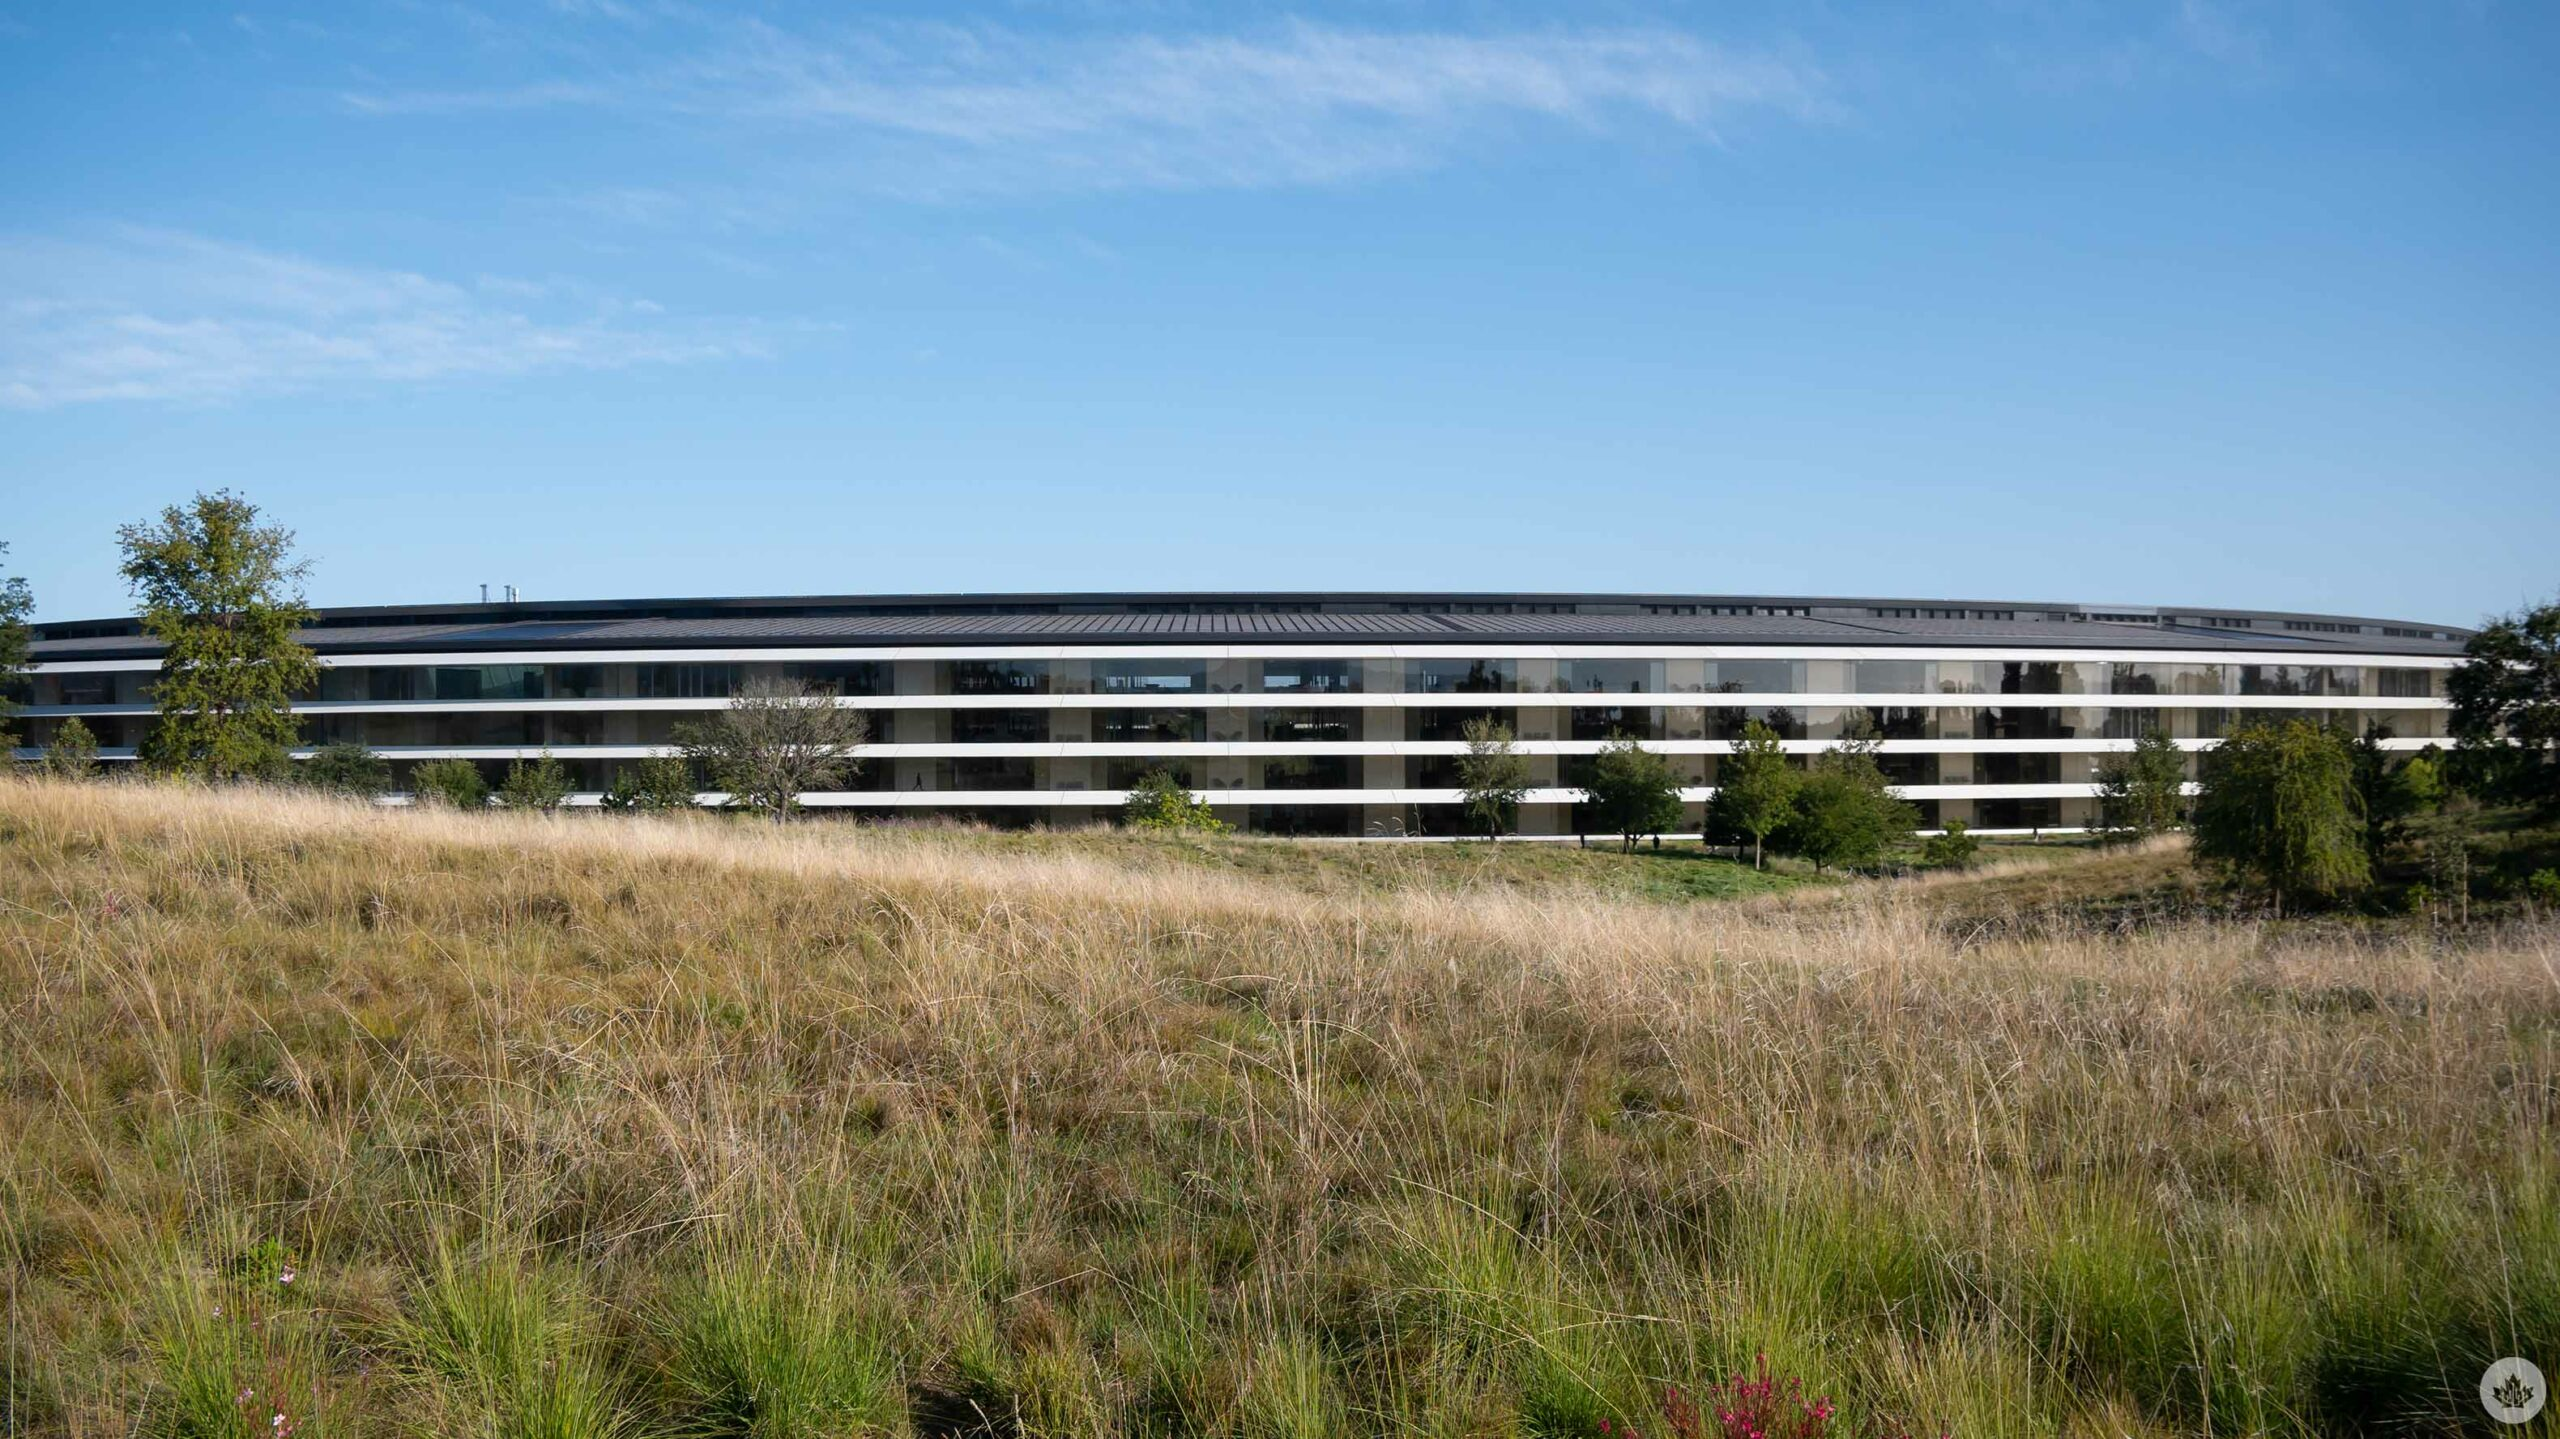 Apple's spaceship office